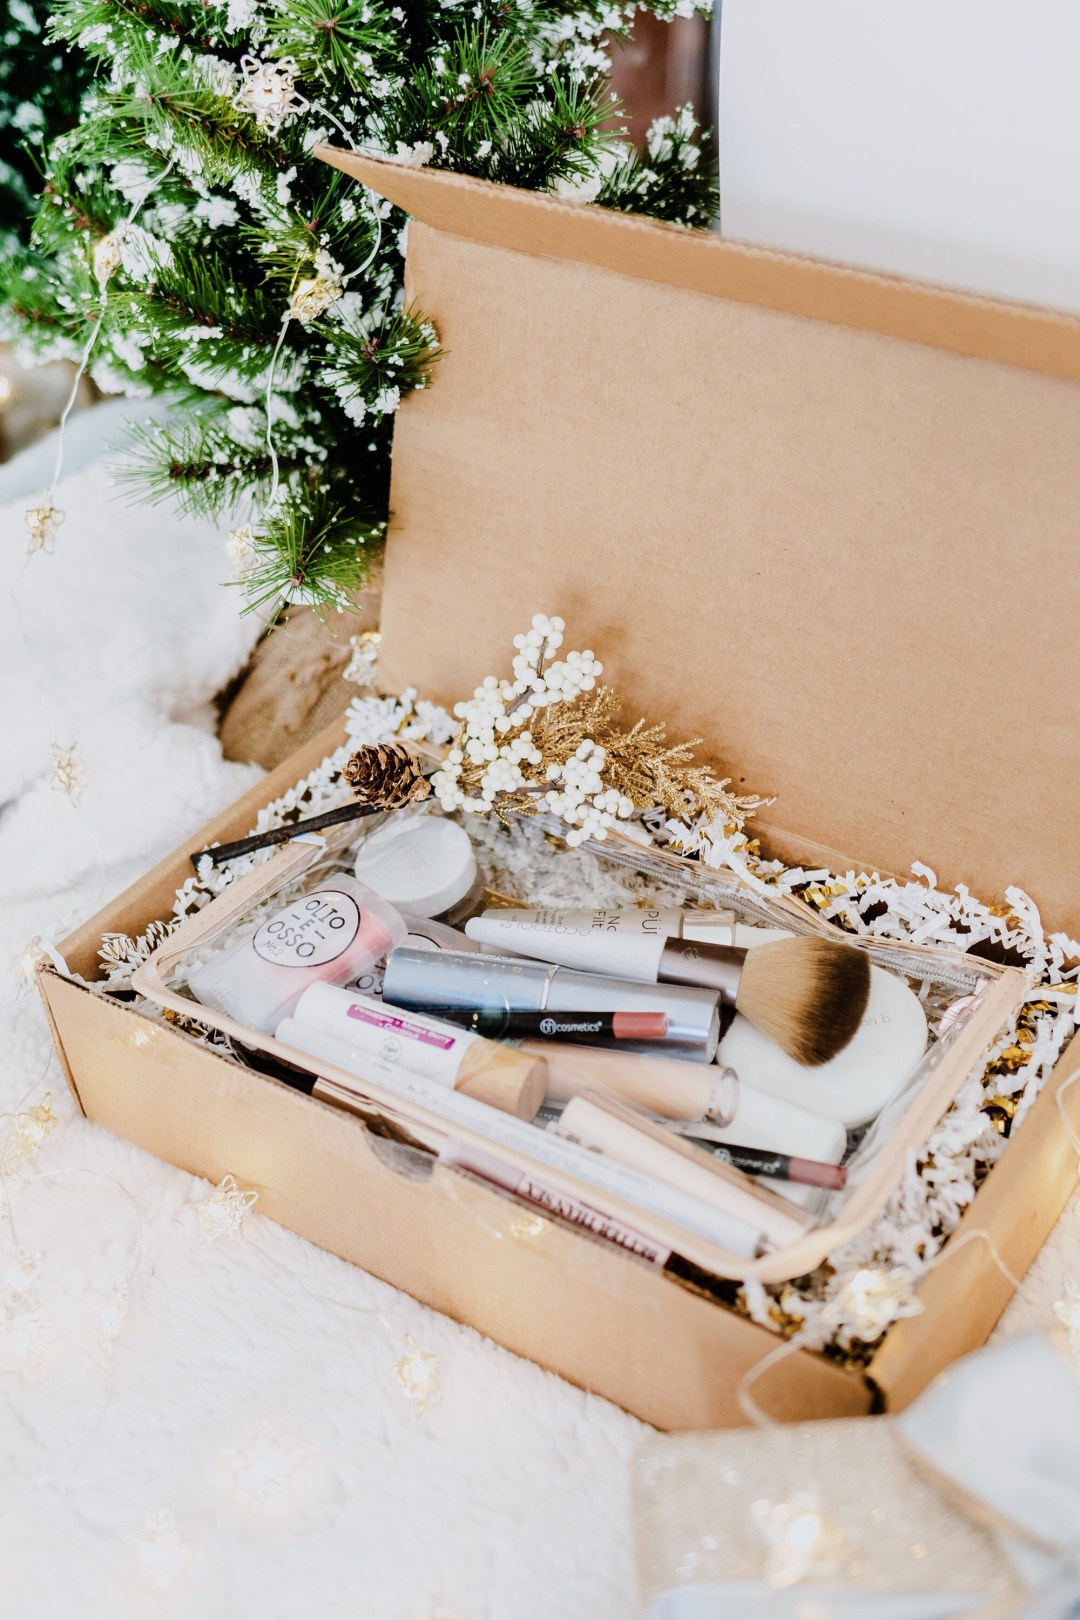 Holiday Gift Guide : DIY Clean Makeup Box